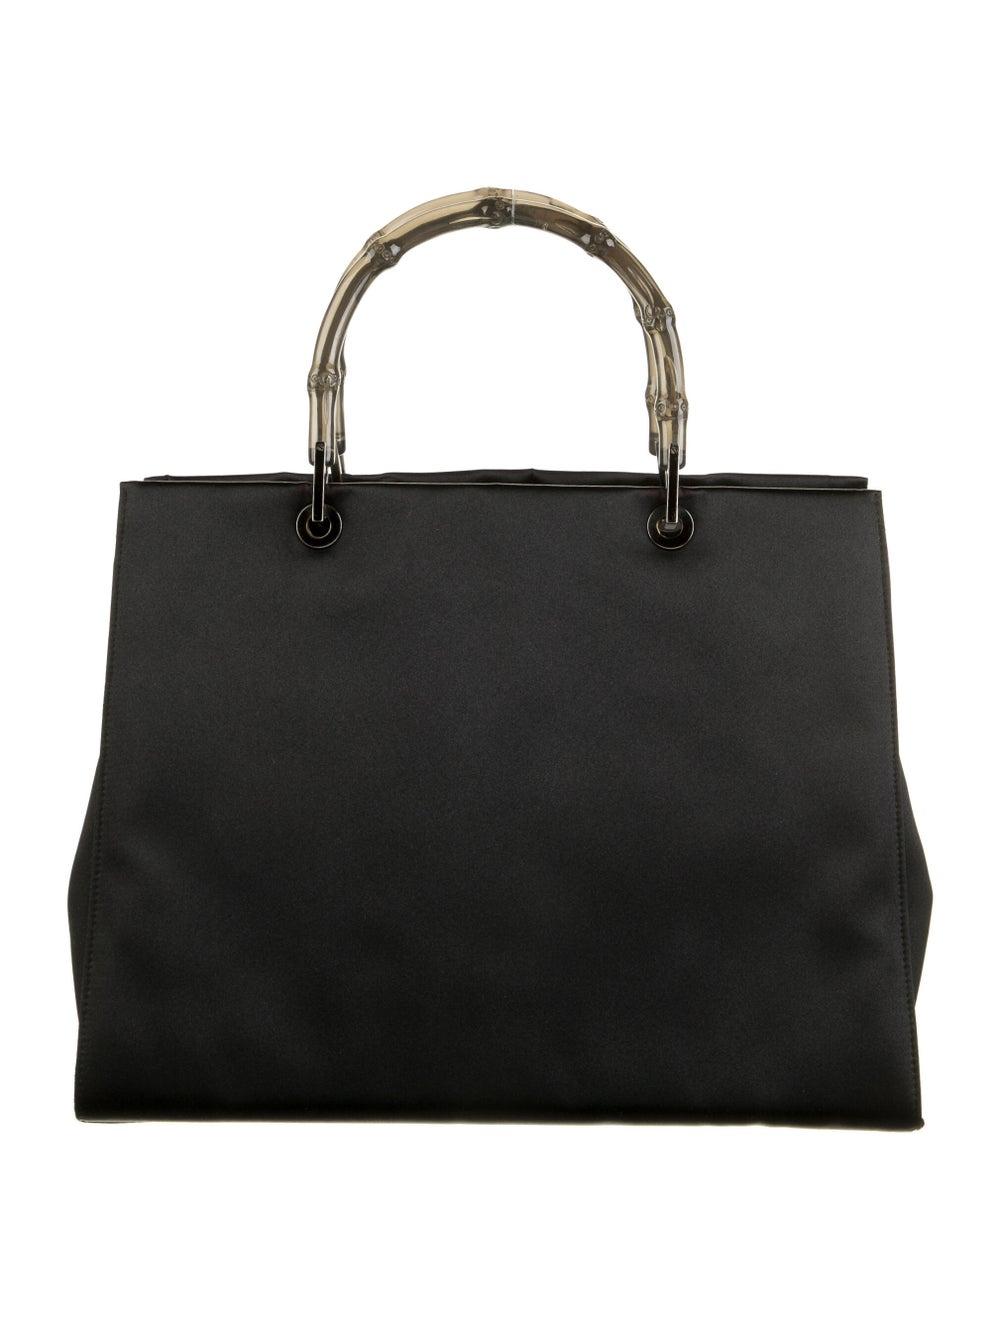 Gucci Clear Bamboo Satin Diana Handle Bag Black - image 4